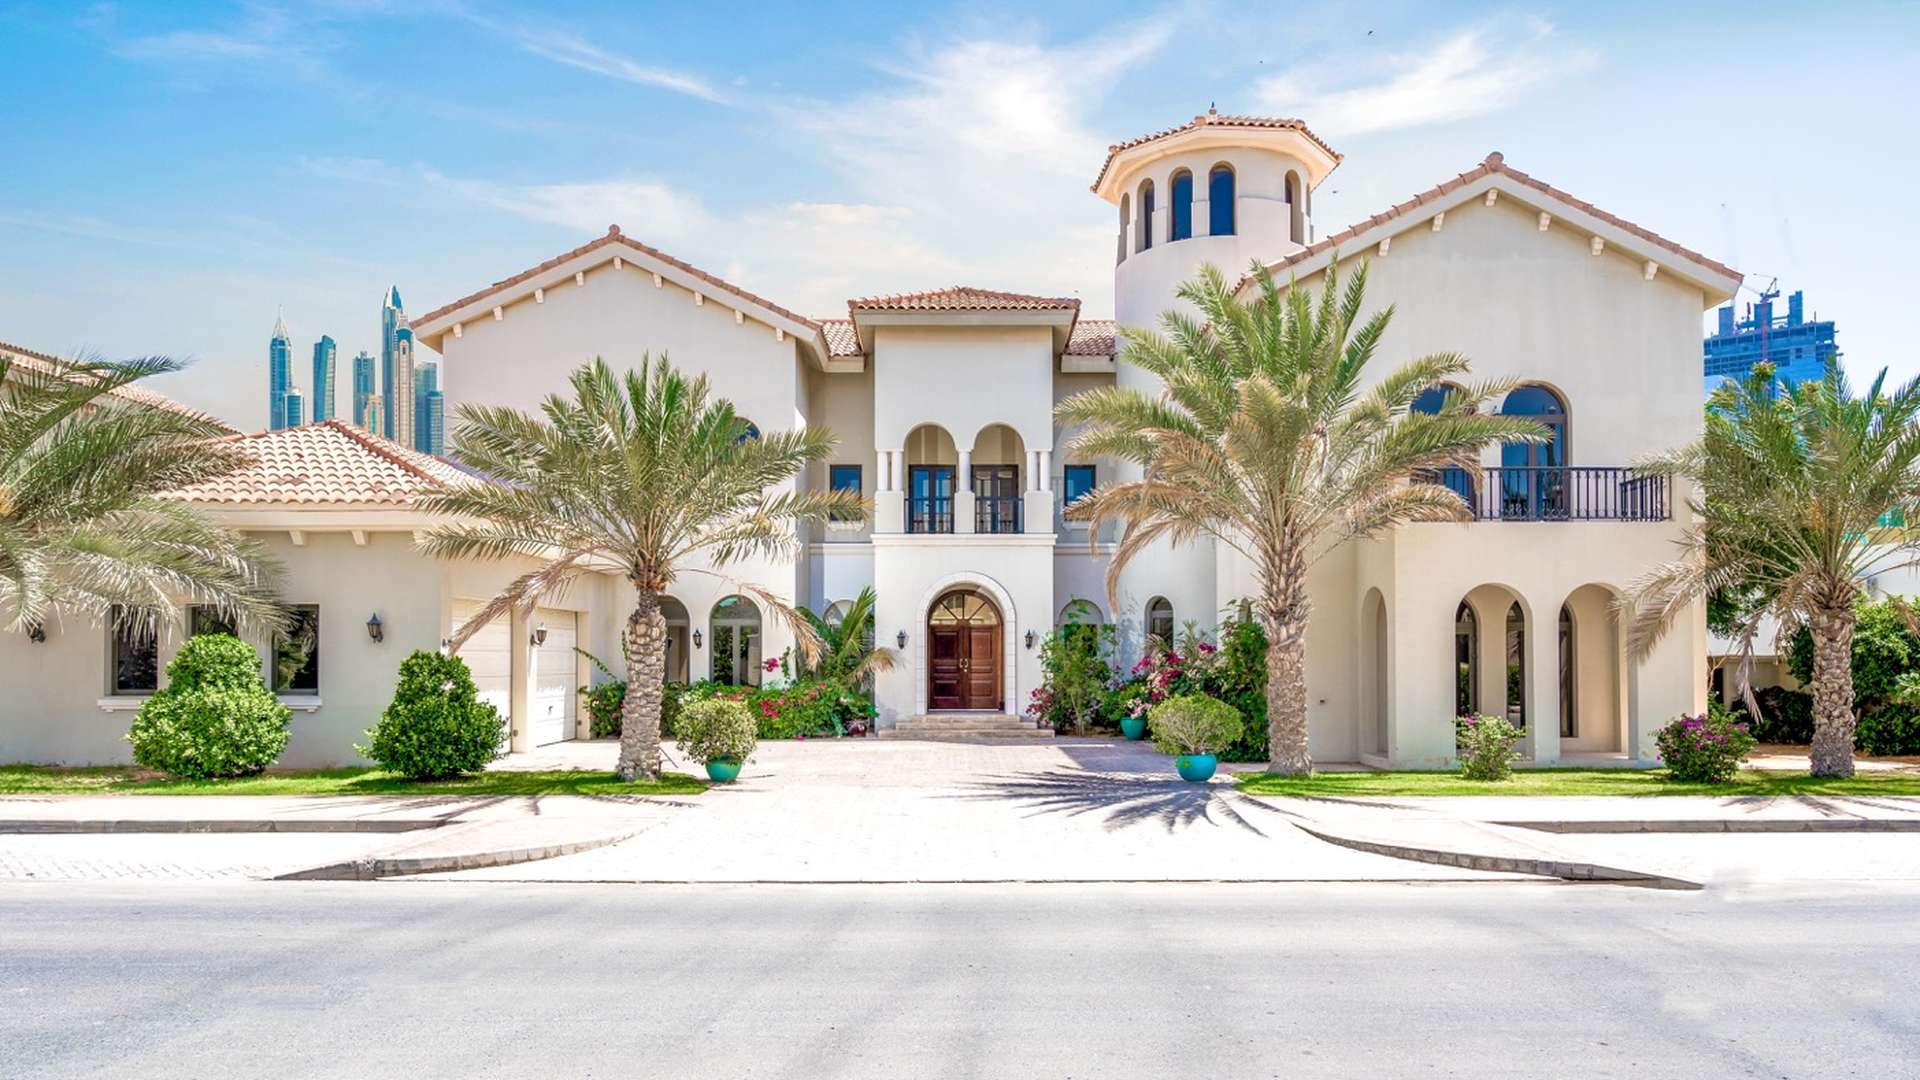 Palm Frond Villas by Nakheel in Palm Jumeirah. Premium villas for Sale in Dubai 3 3